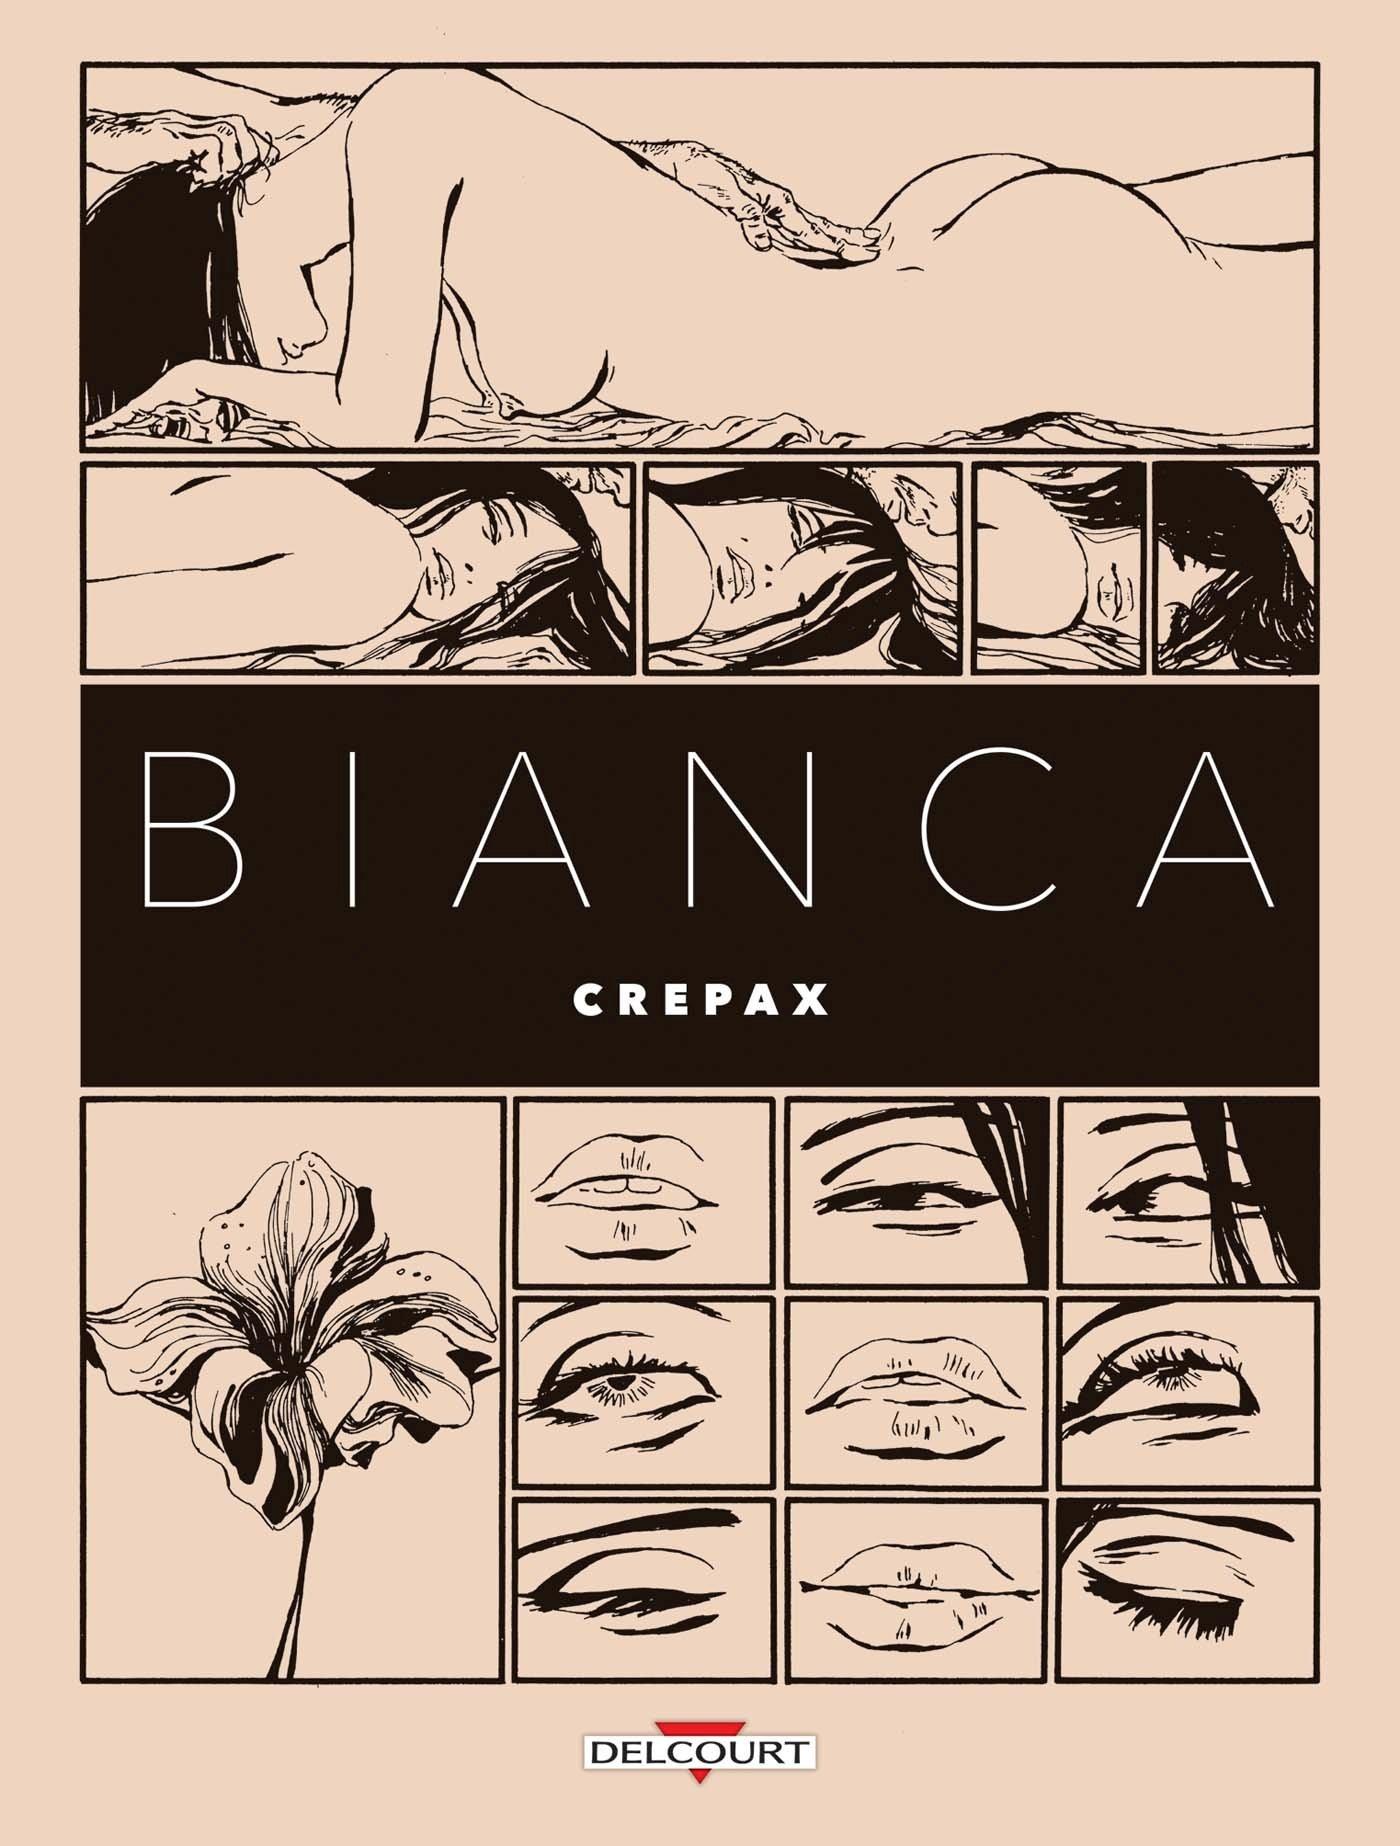 Bianca Album – 24 mai 2017 Guido Crepax Delcourt 2756081760 BD tout public